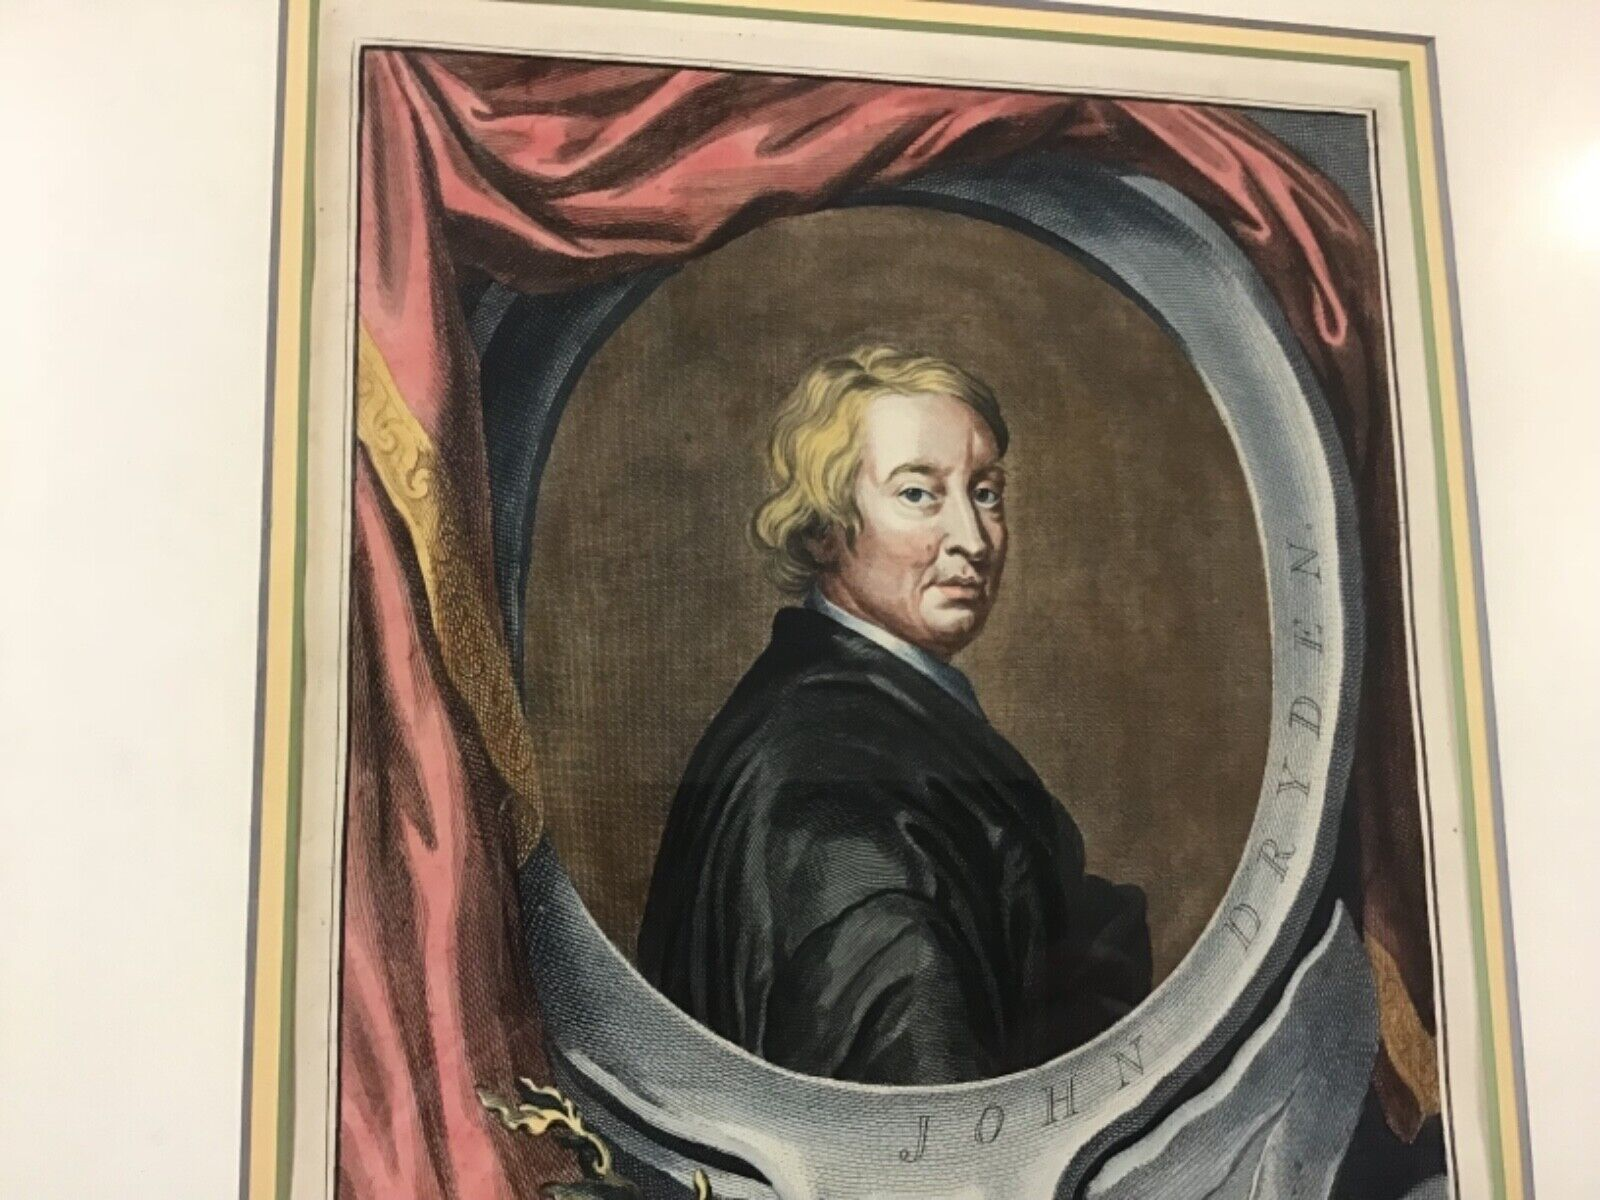 Handcolored 1743 Engraving Of John Dryden Engraved By Jacobus Houbraken